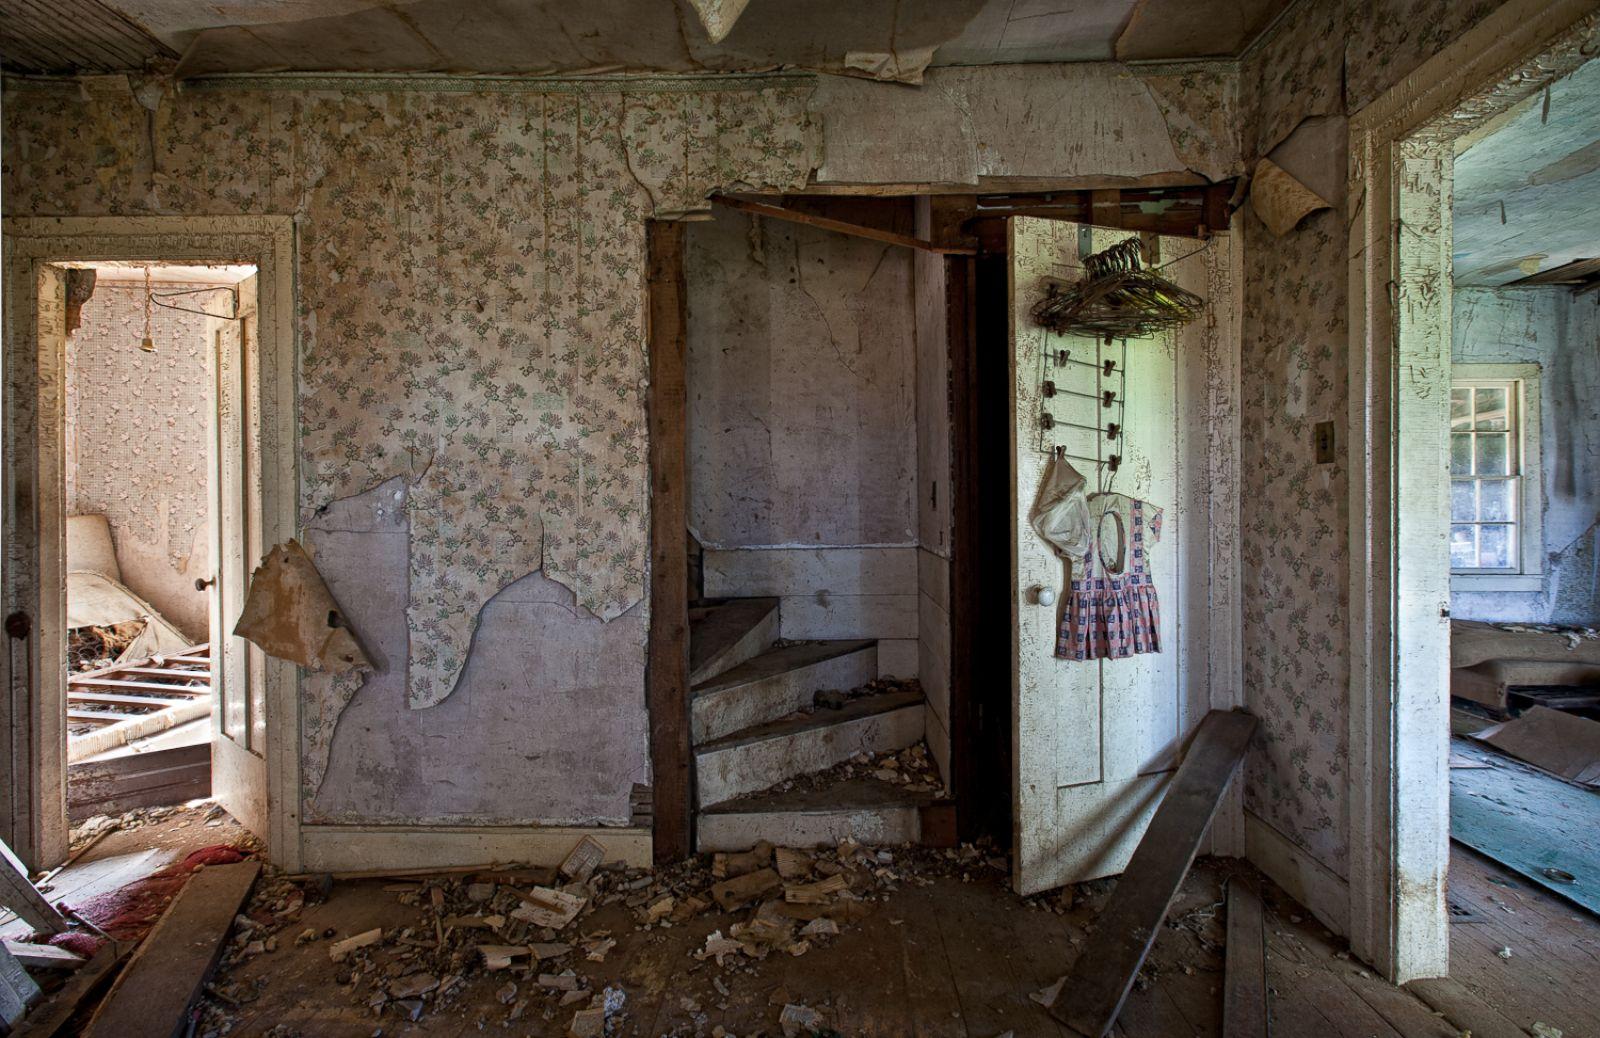 Abandoned america everything left behind photos image for Abandoned neighborhoods in america